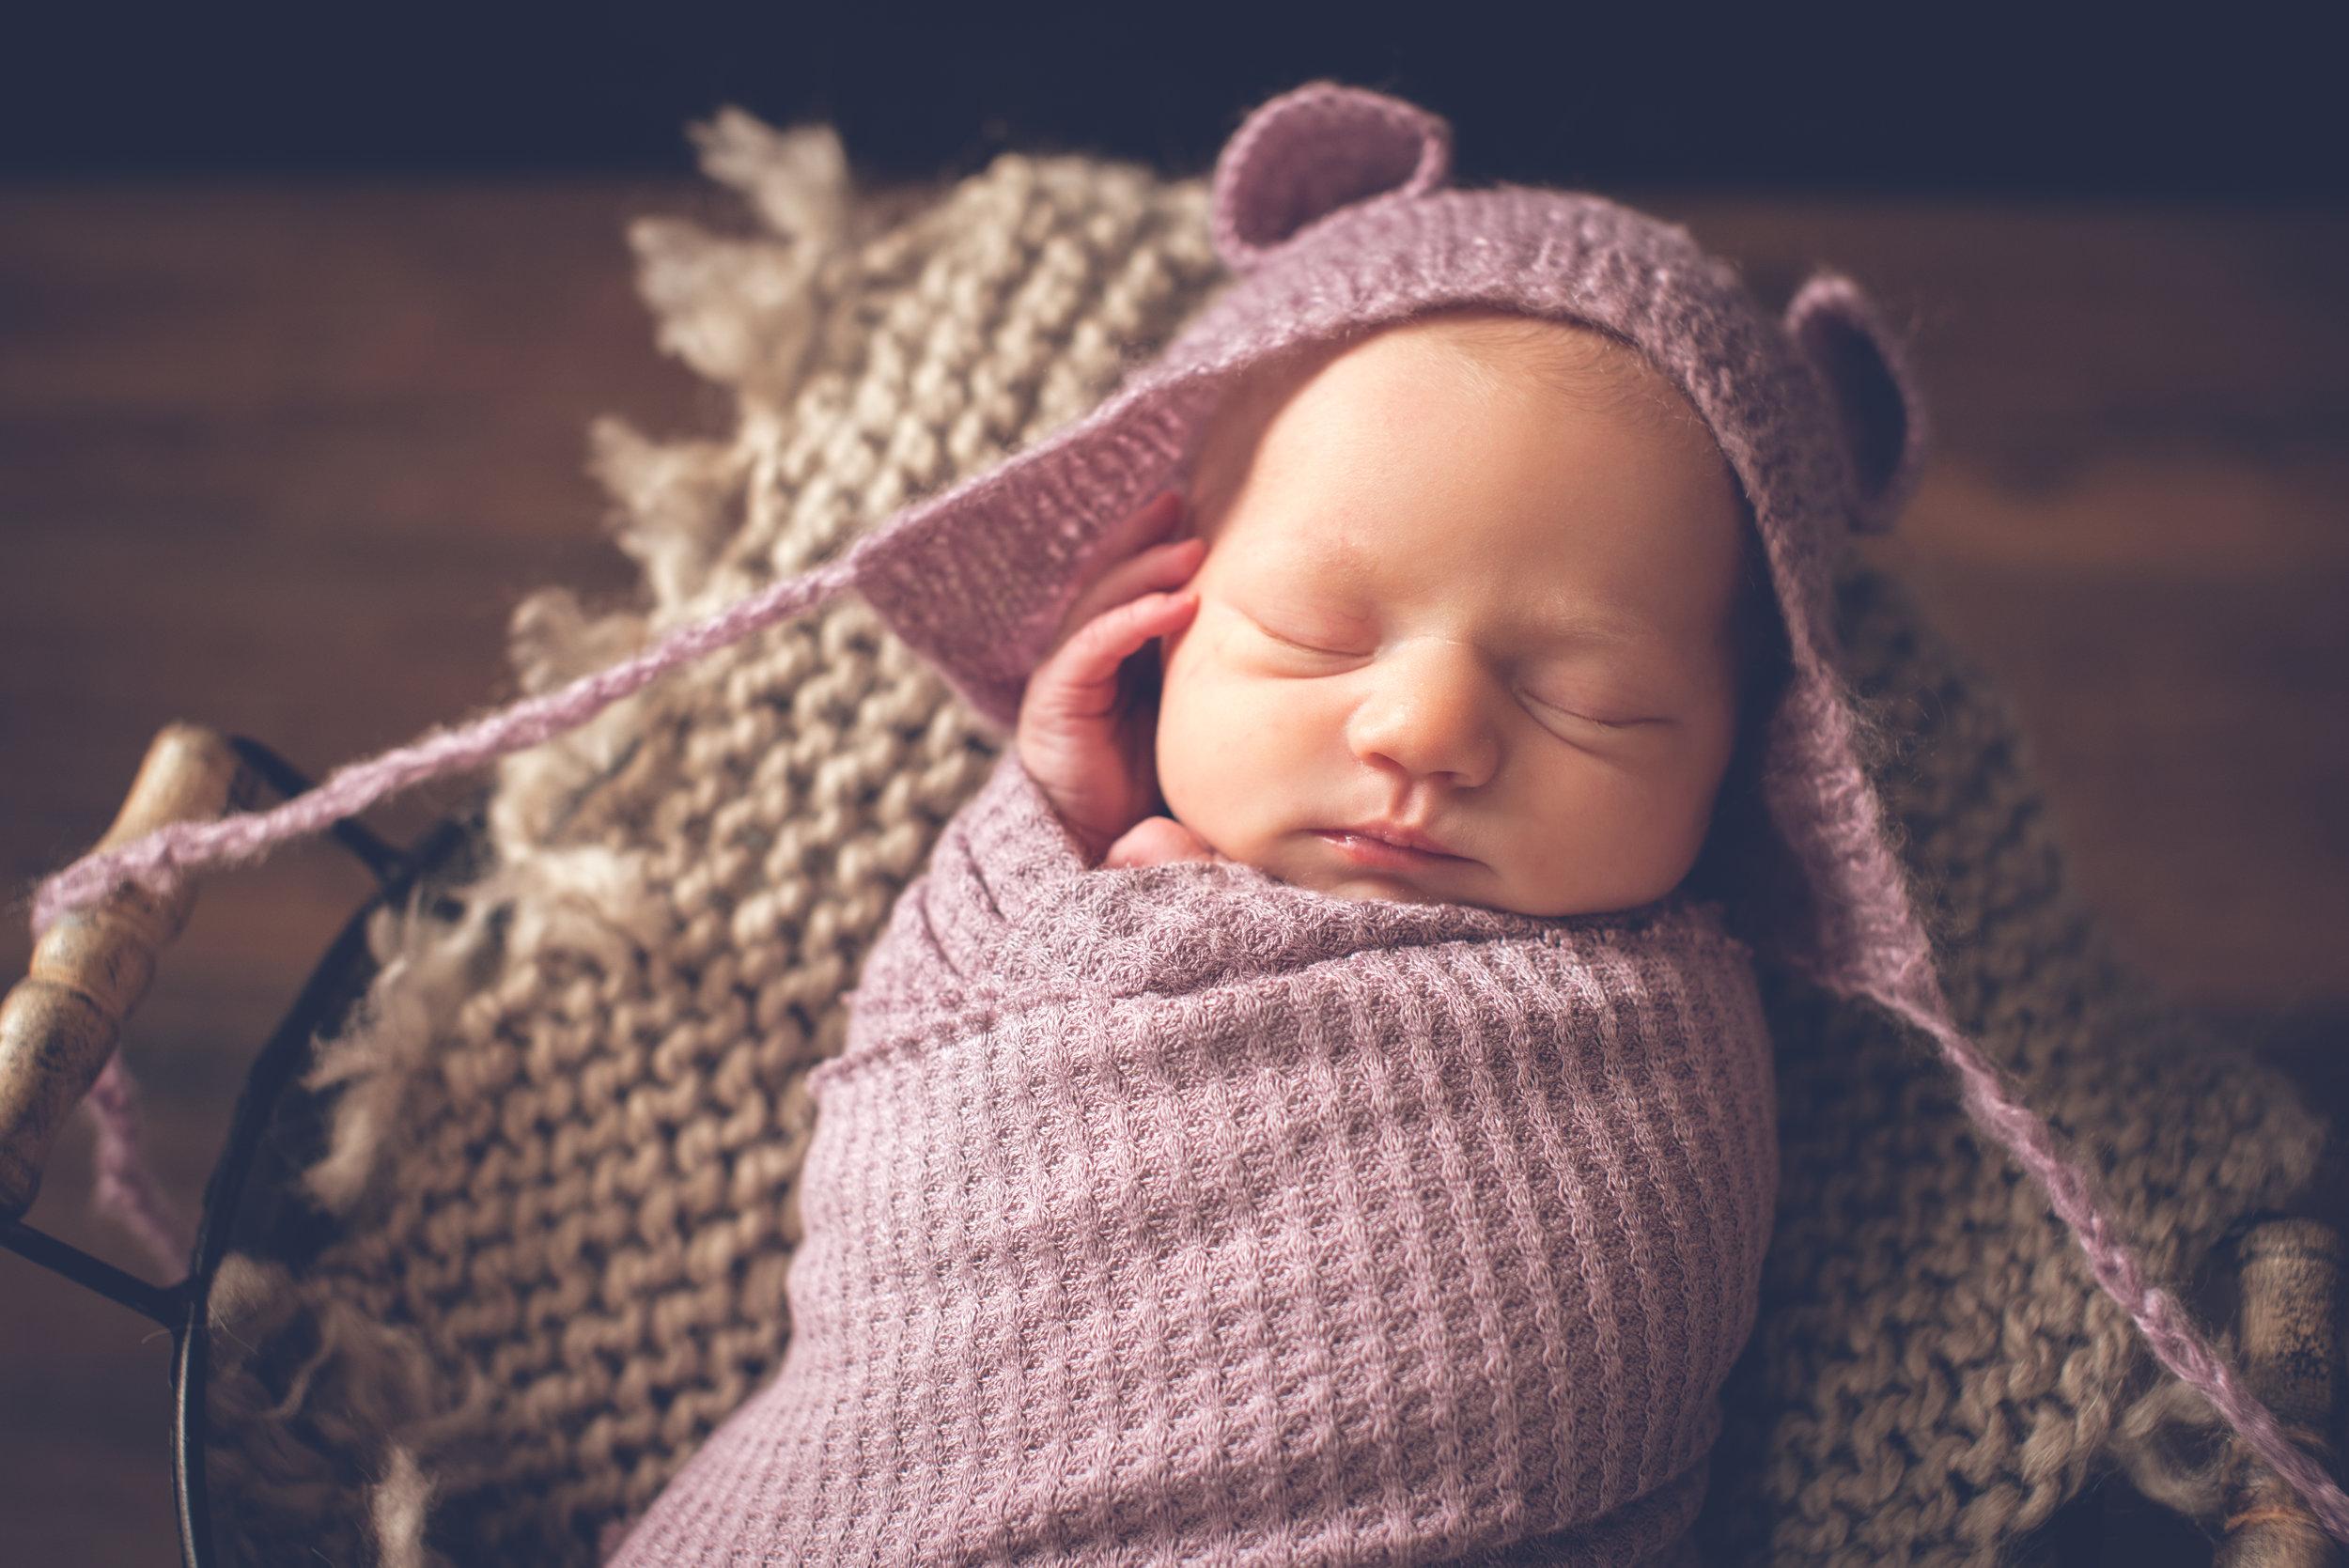 Newborn_AdalynnJane_9Days-11.jpg